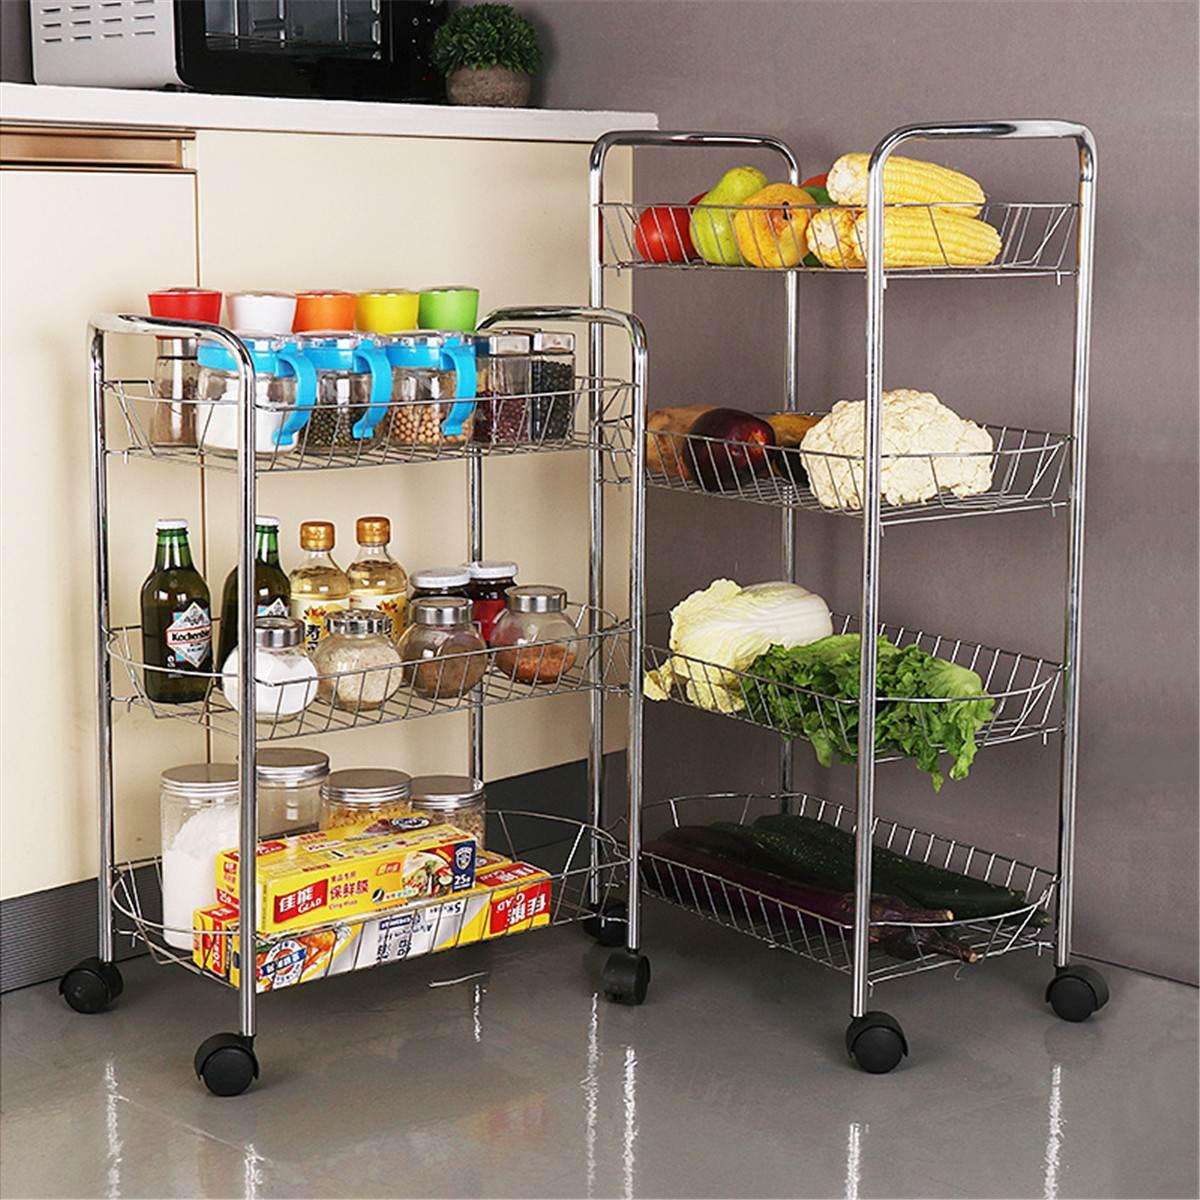 3/4 Tier Storage Organizer Rack Movable Kitchen Bathroom Shelf Metal Rolling Trolley Cart Basket Stand Wheels Save Space Holder